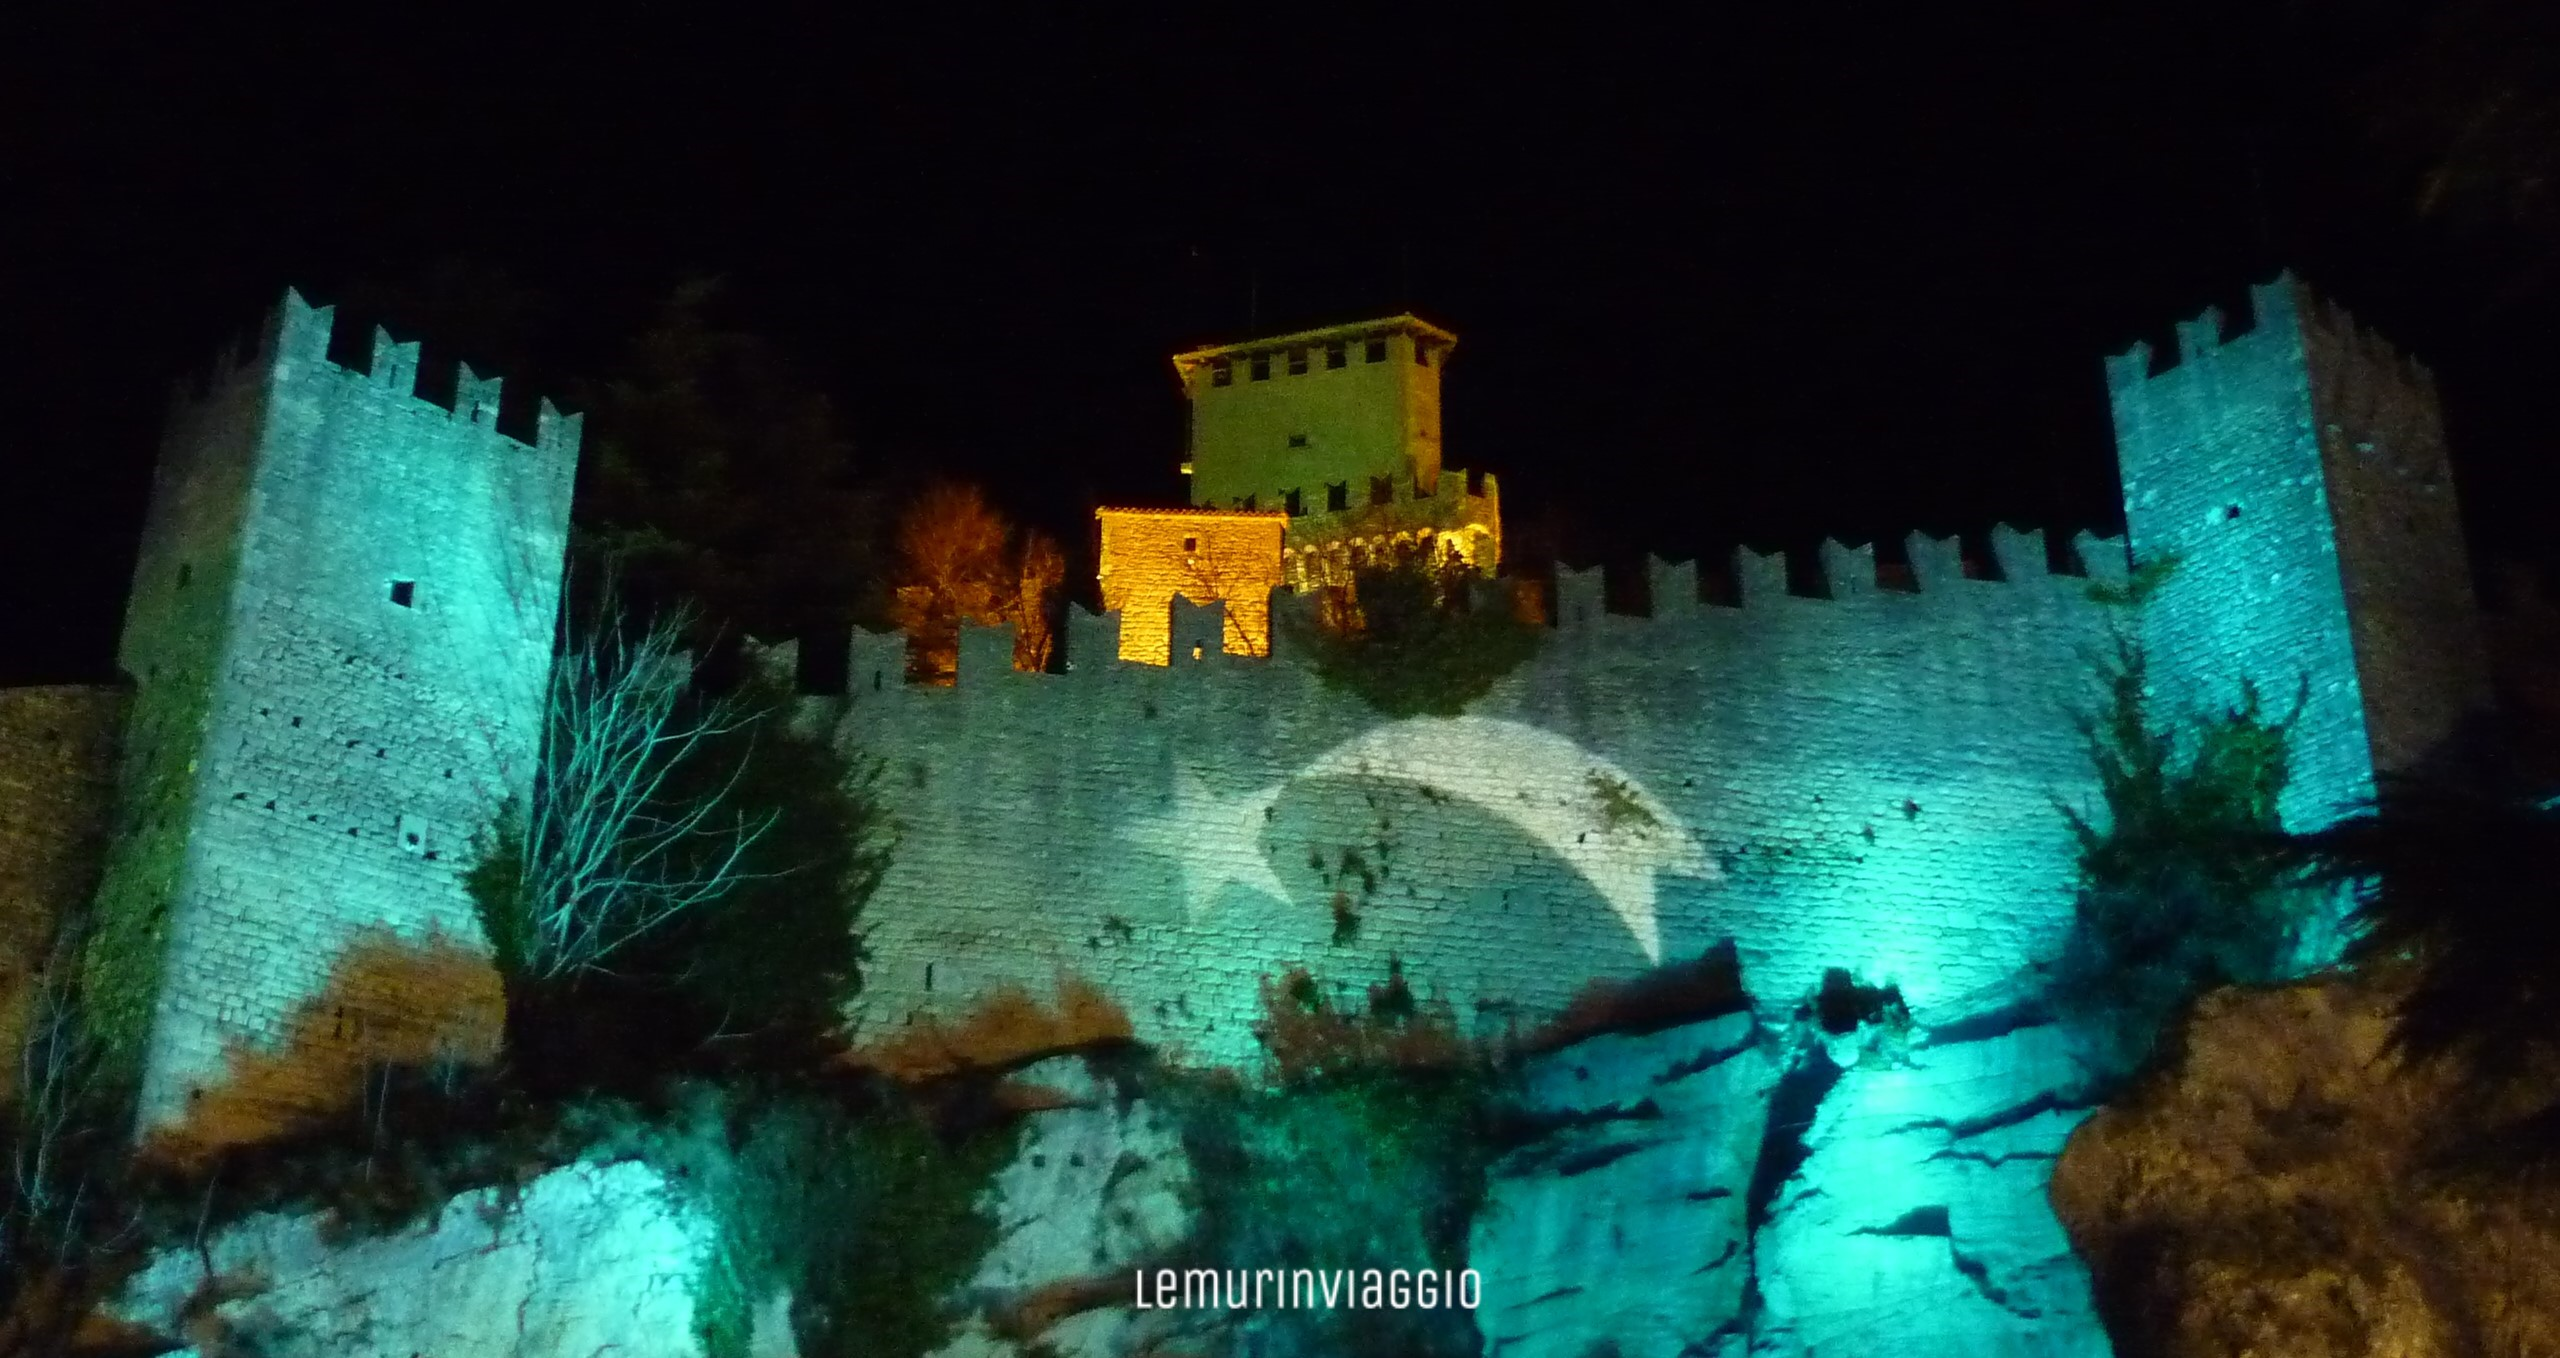 San Marino lemurinviaggio-rsm-1